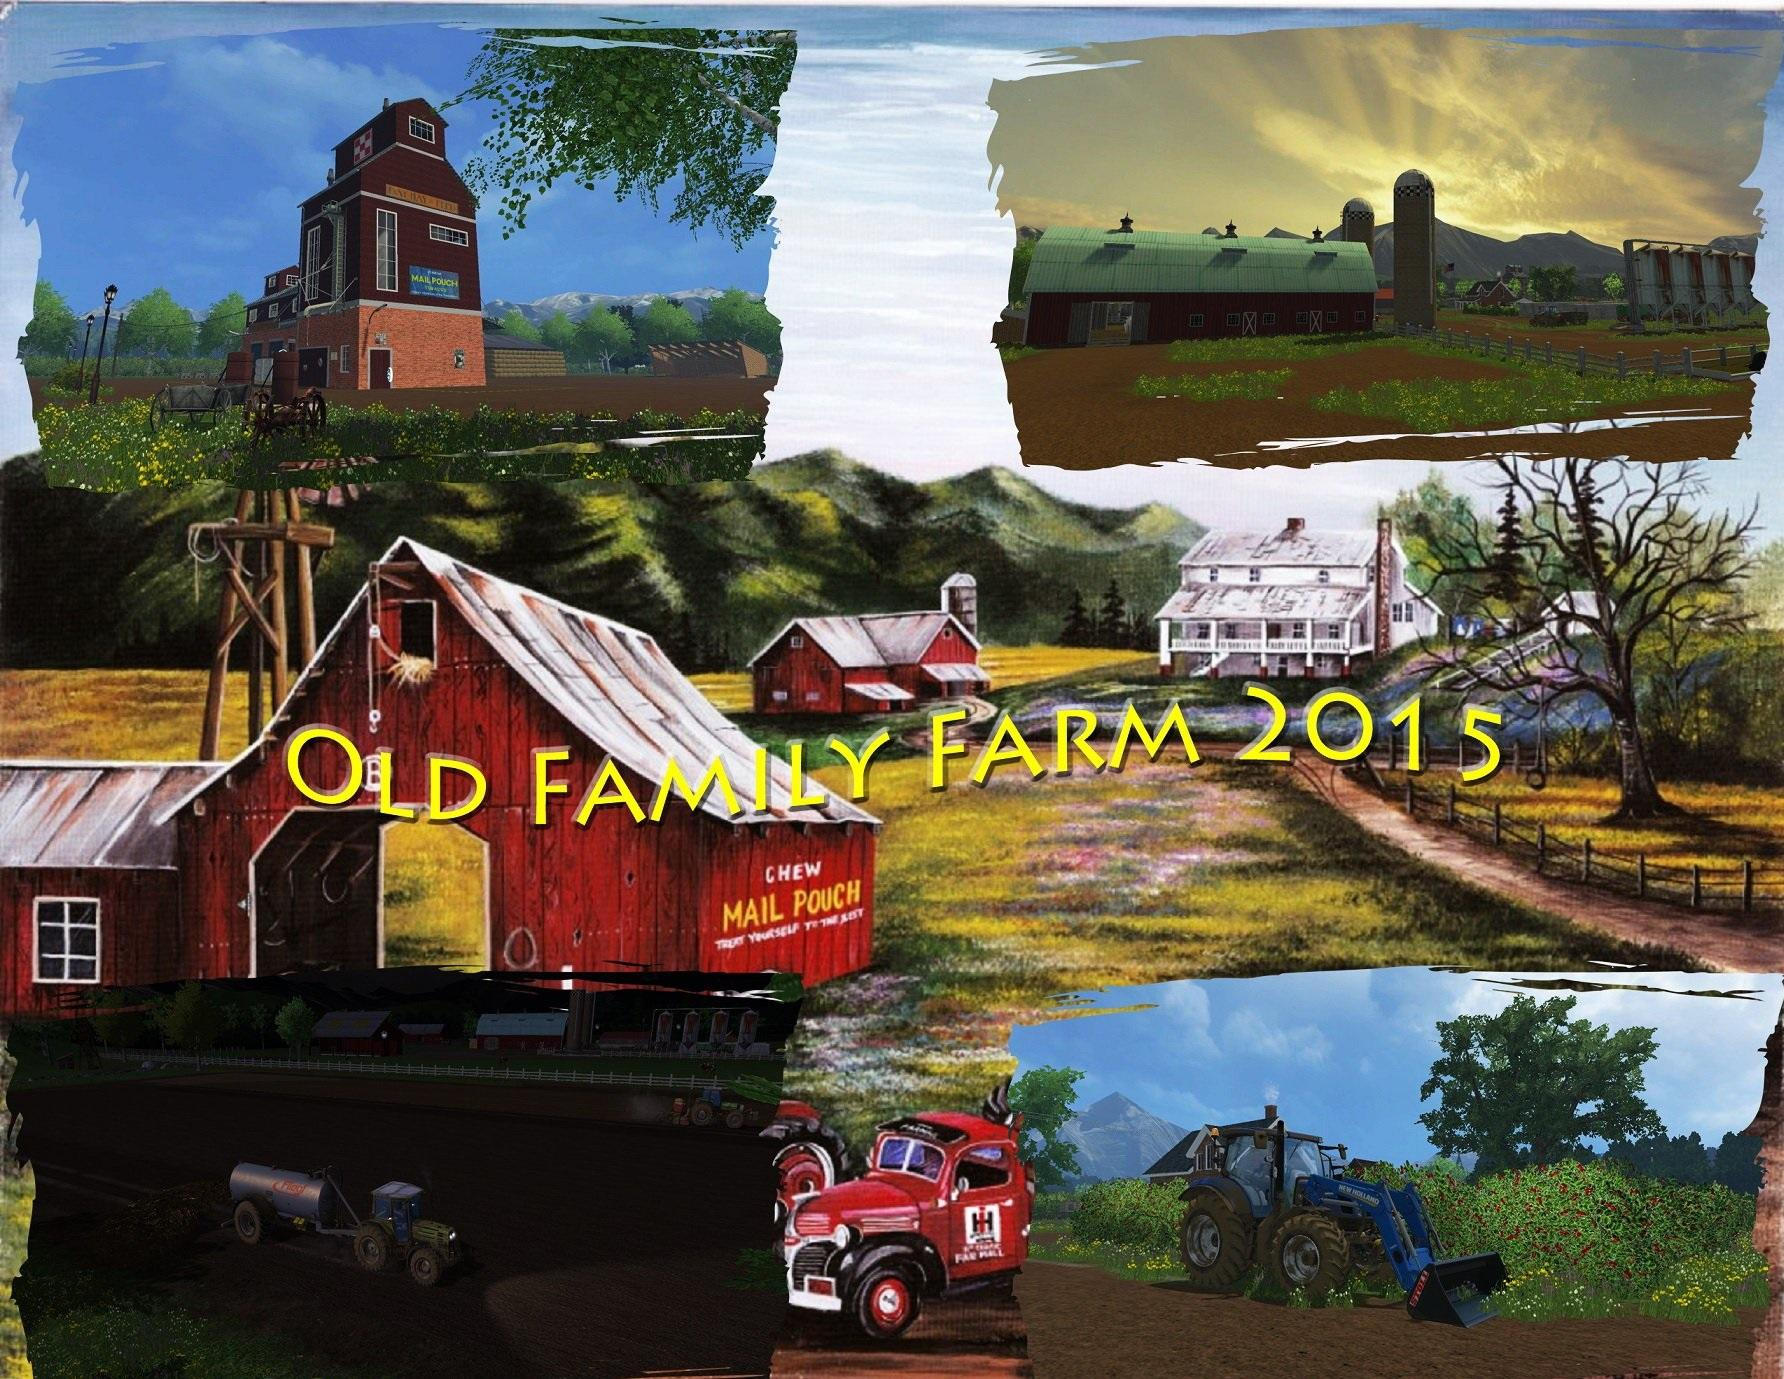 OLD FAMILY FARM MAP FS 2015 V10 Farming simulator 2017 2015